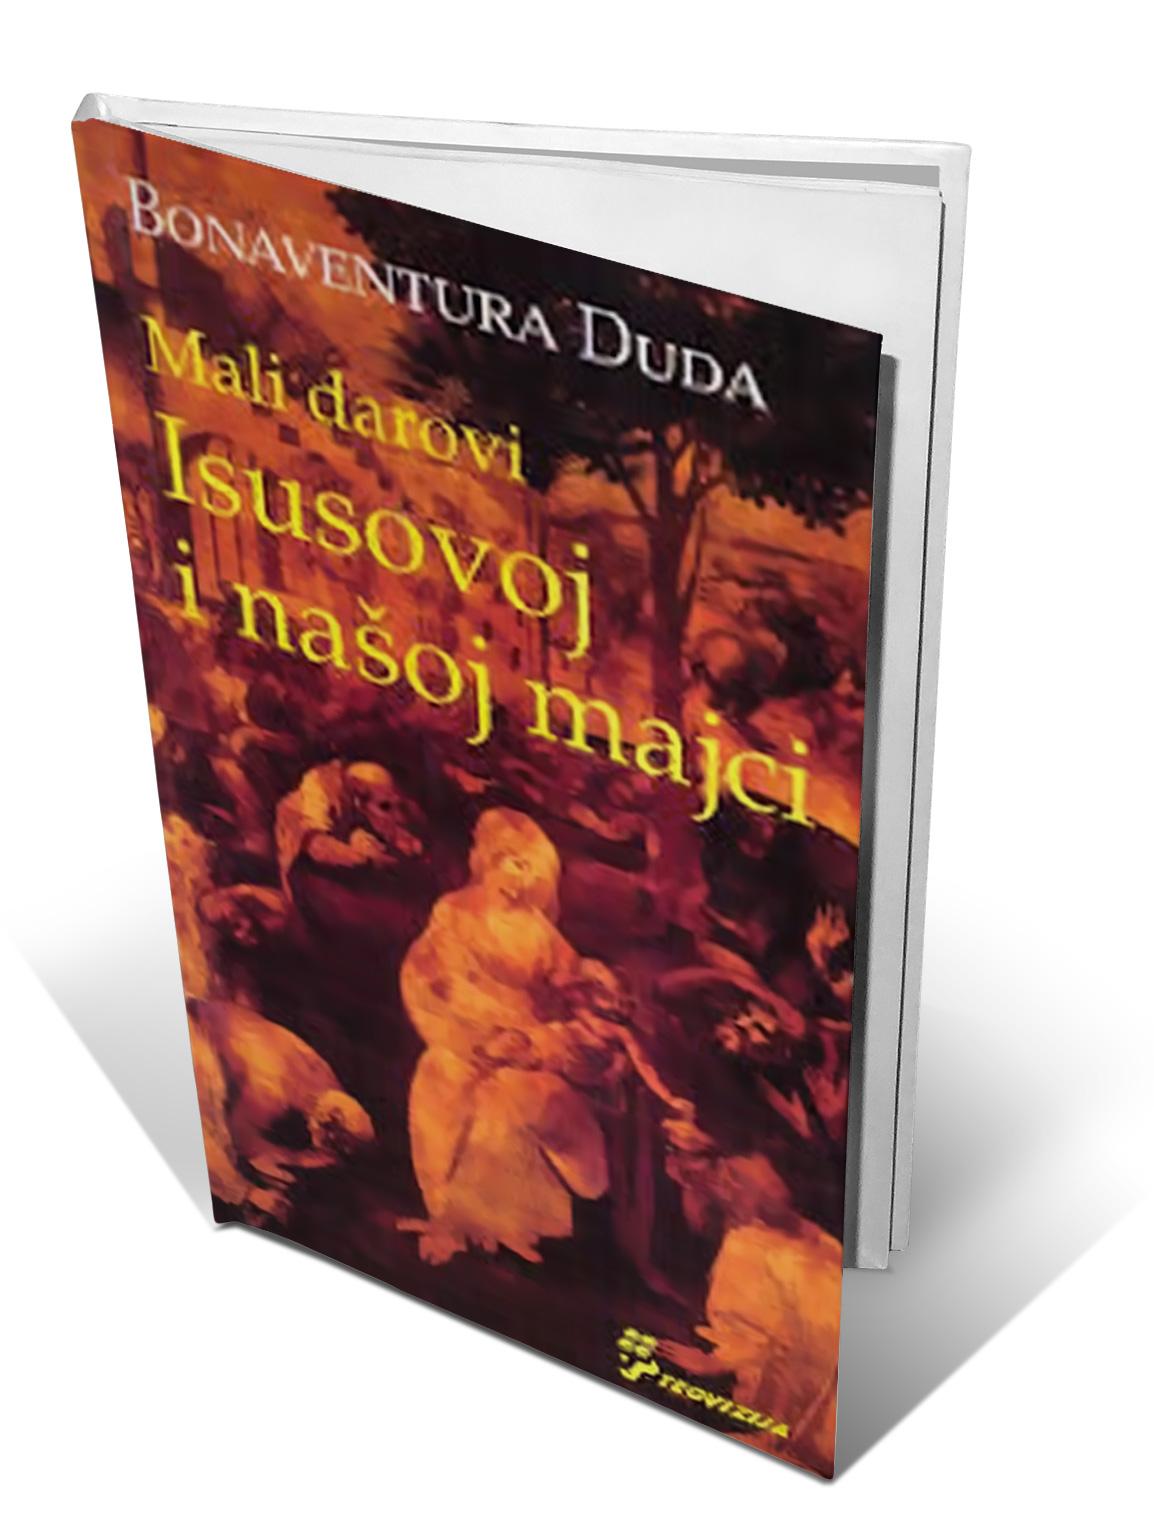 MALI DAROVI ISUSOVOJ I NAŠOJ MAJCI - fra Bonaventura Duda